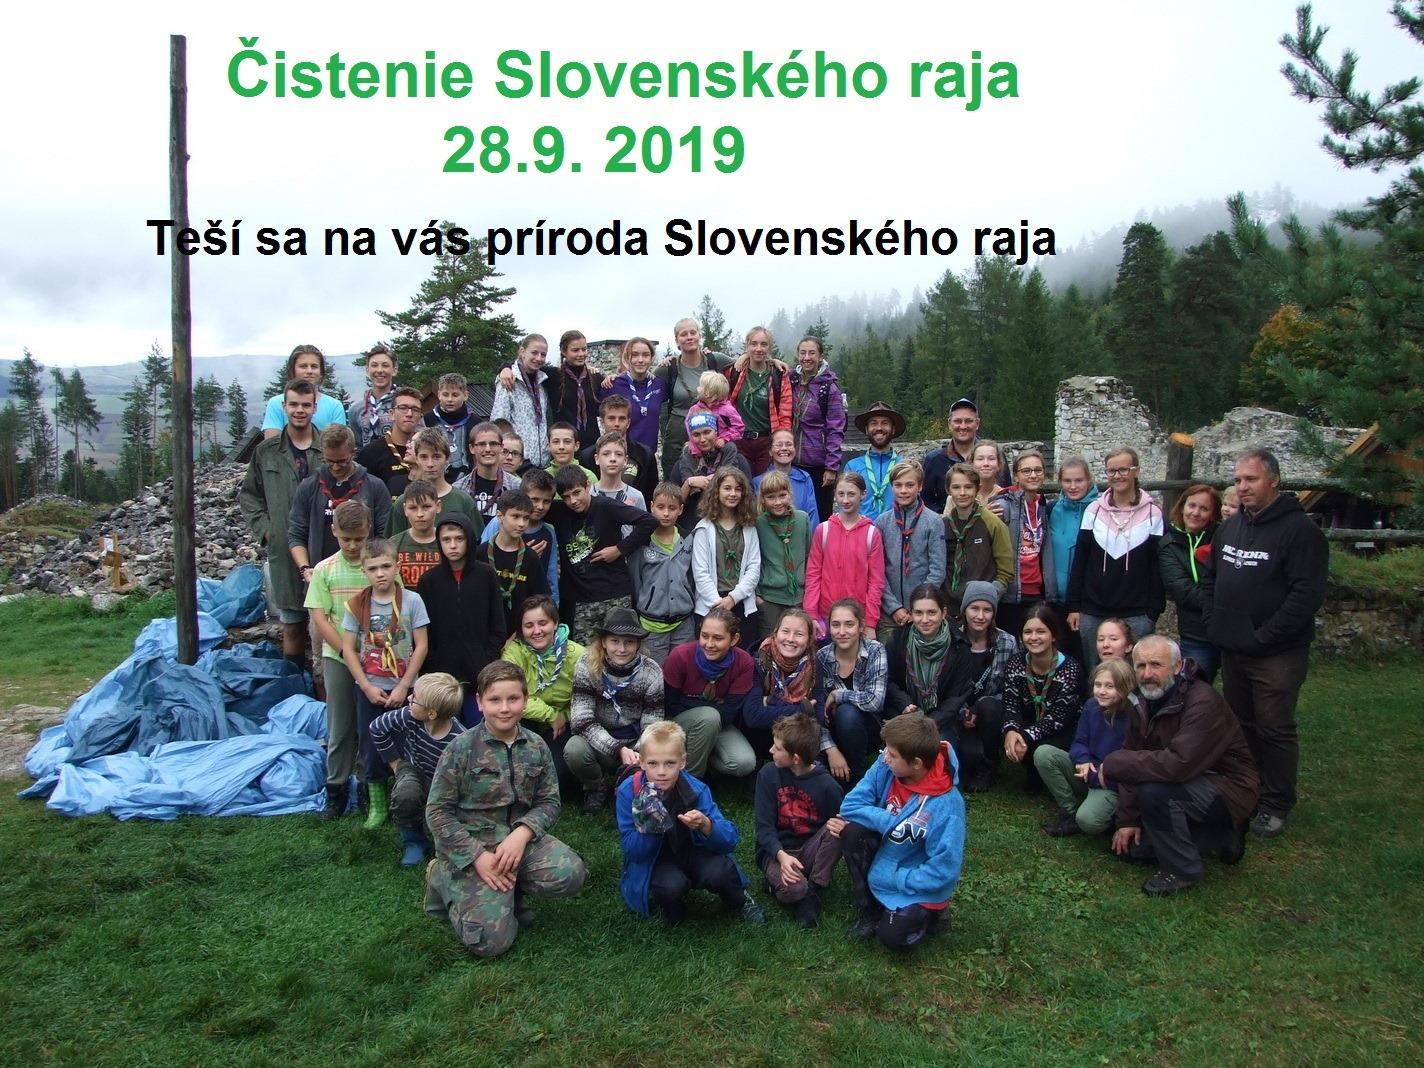 20190917102709_cistenieslovenskehoraja_2019.jpg